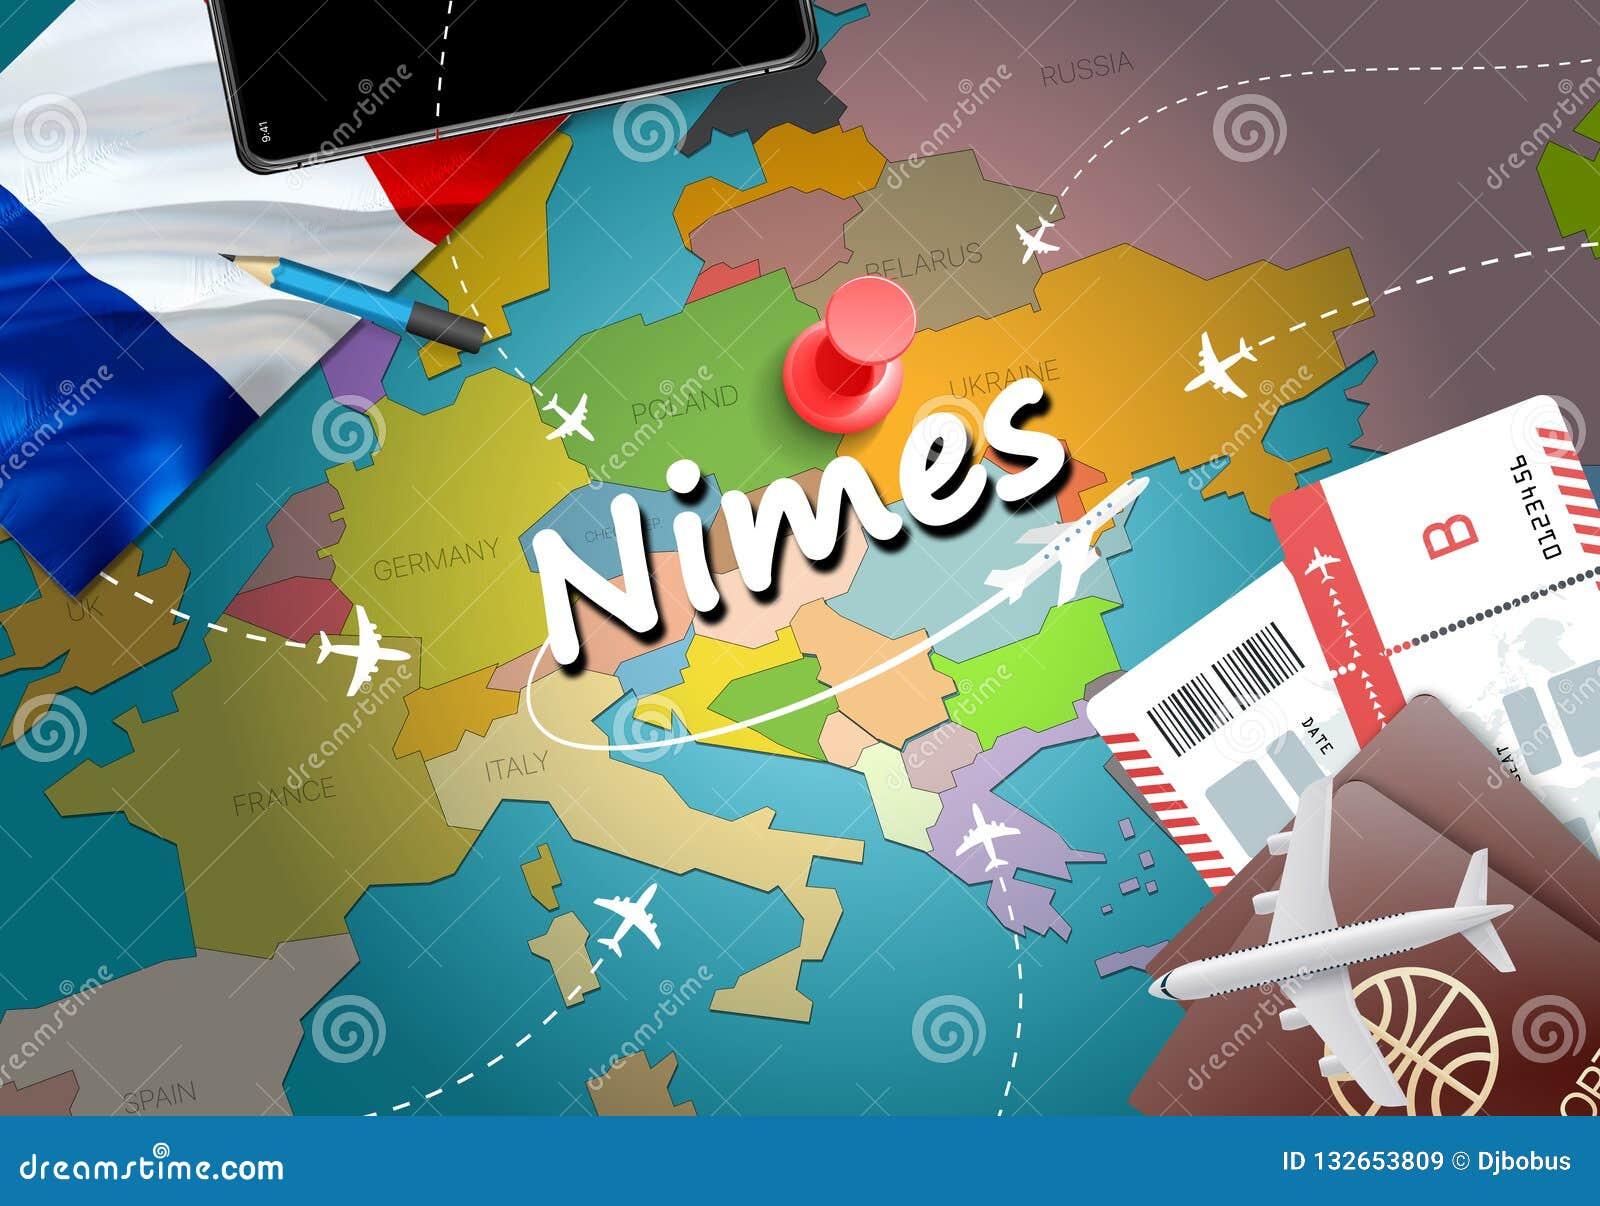 Nimes City Travel And Tourism Destination Concept France Flag A